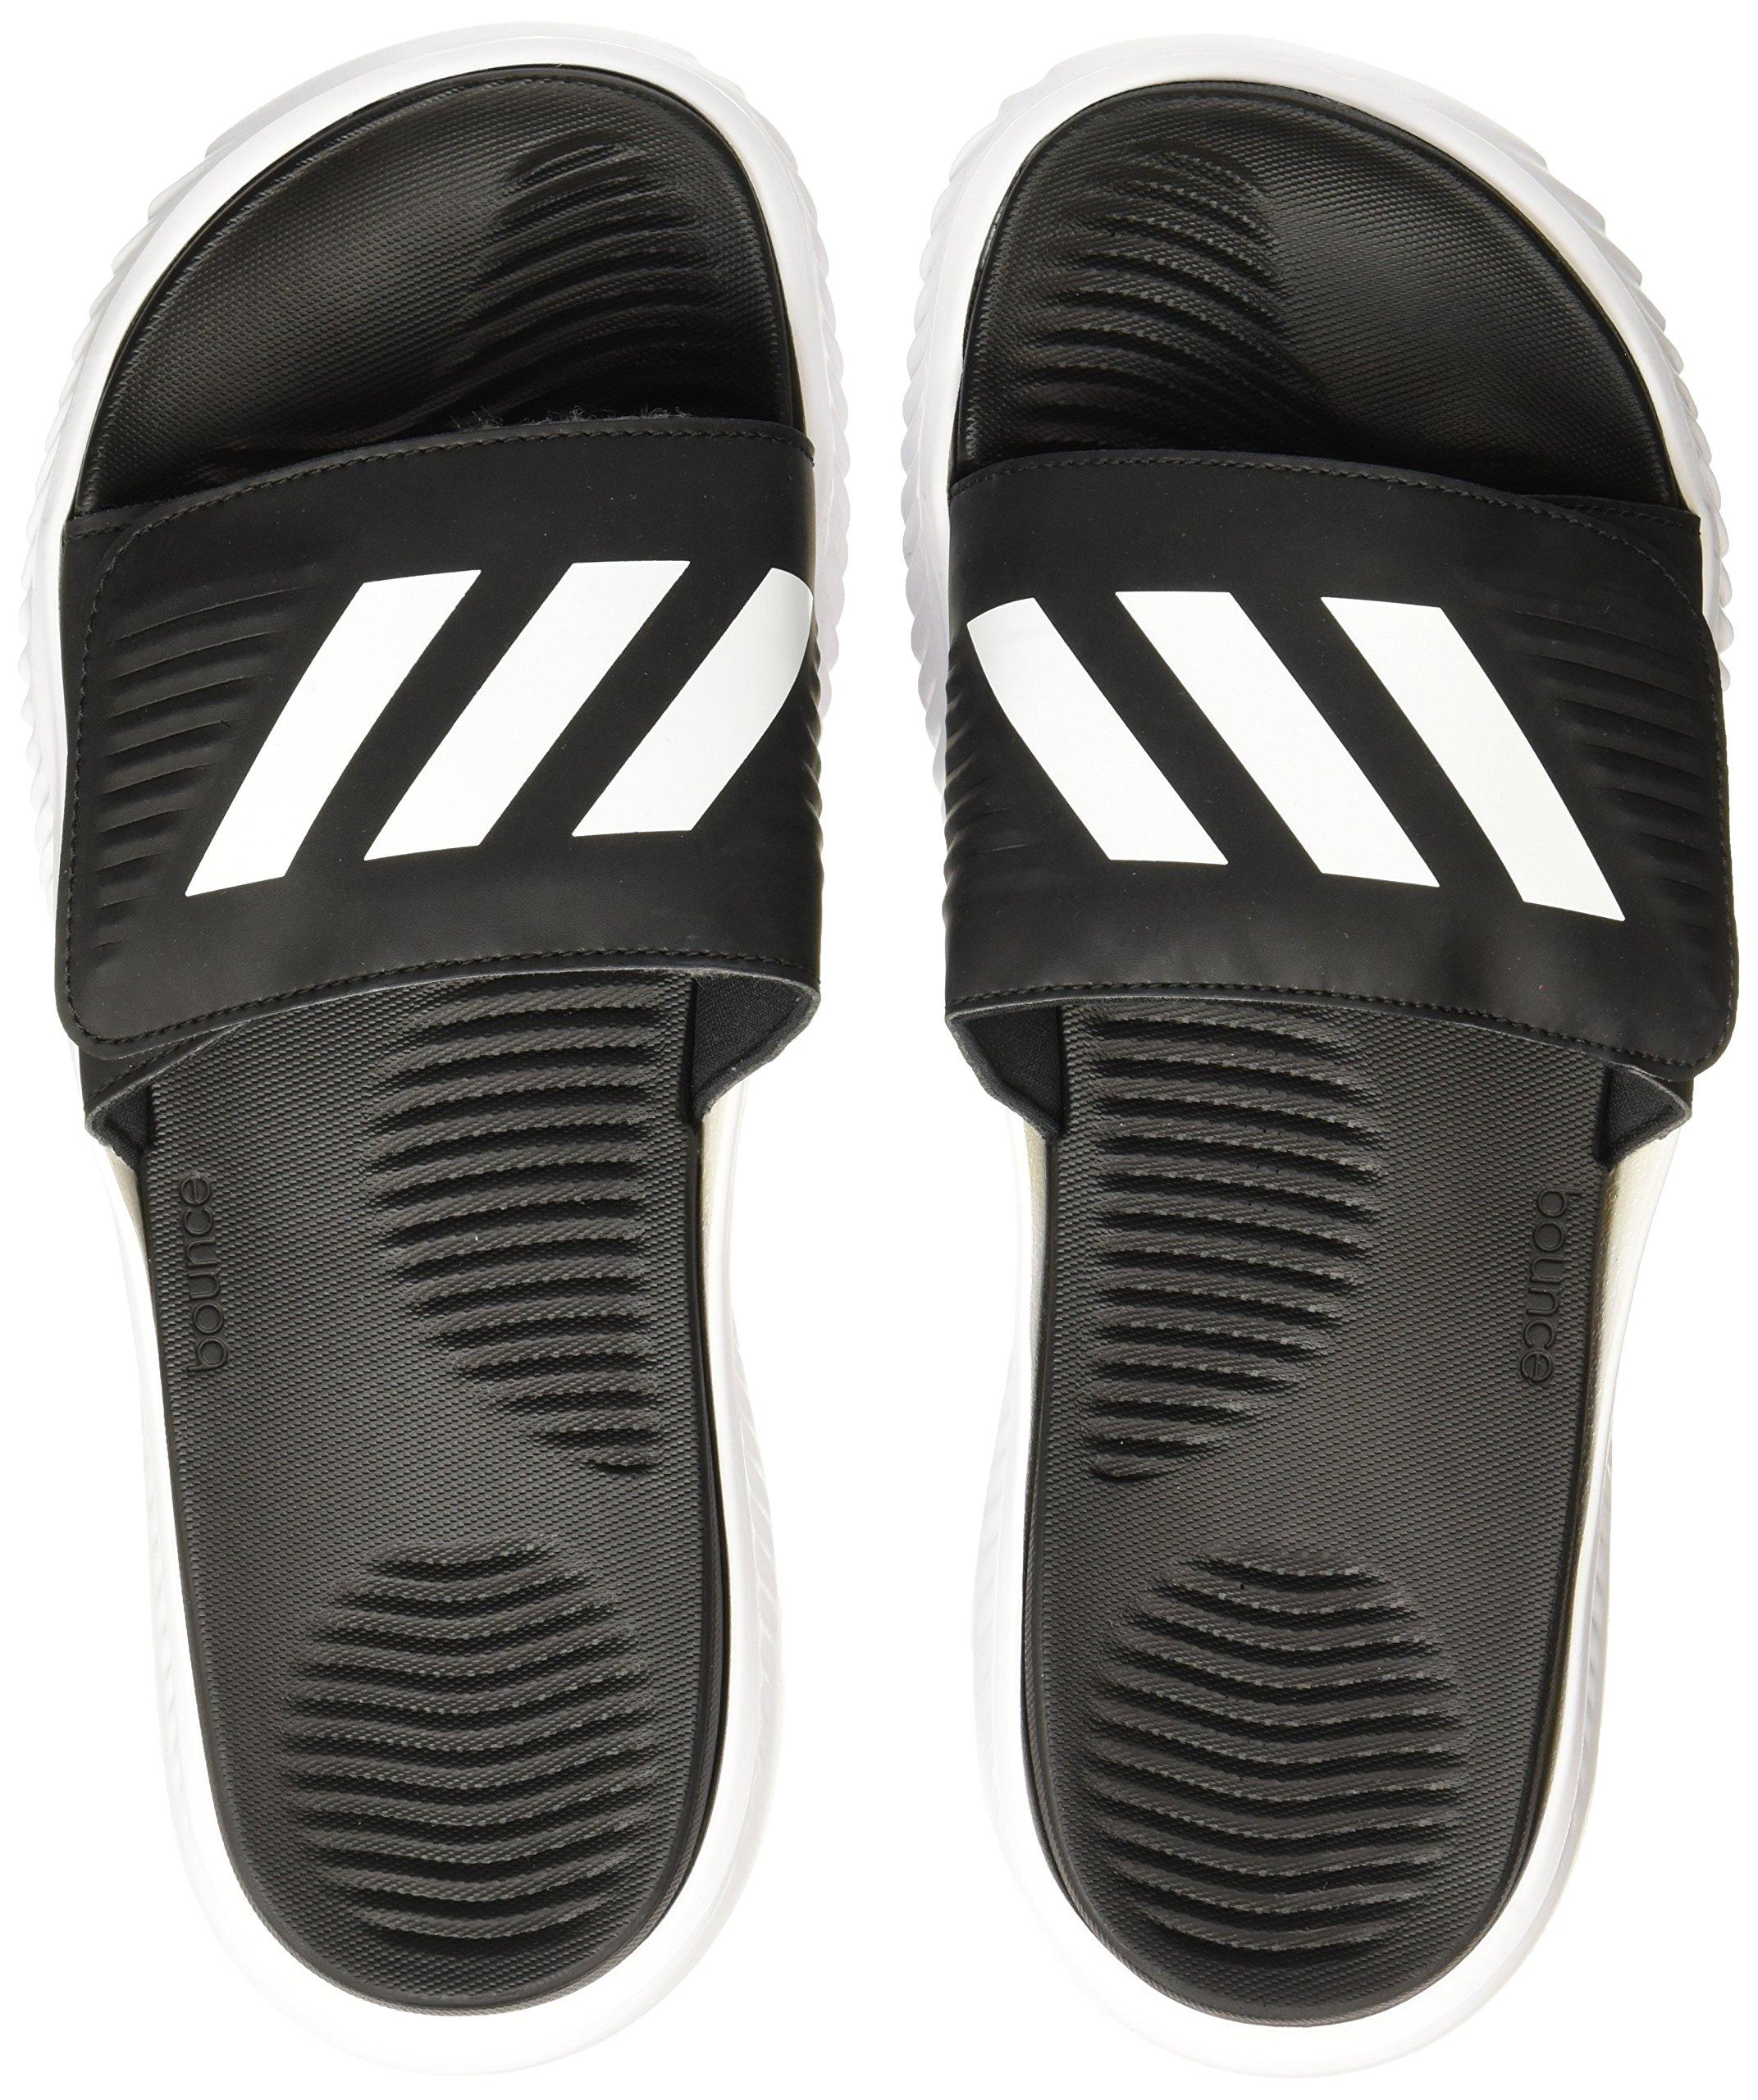 Amazon price history for Adidas Men's Alphabounce Slide Flip-Flops